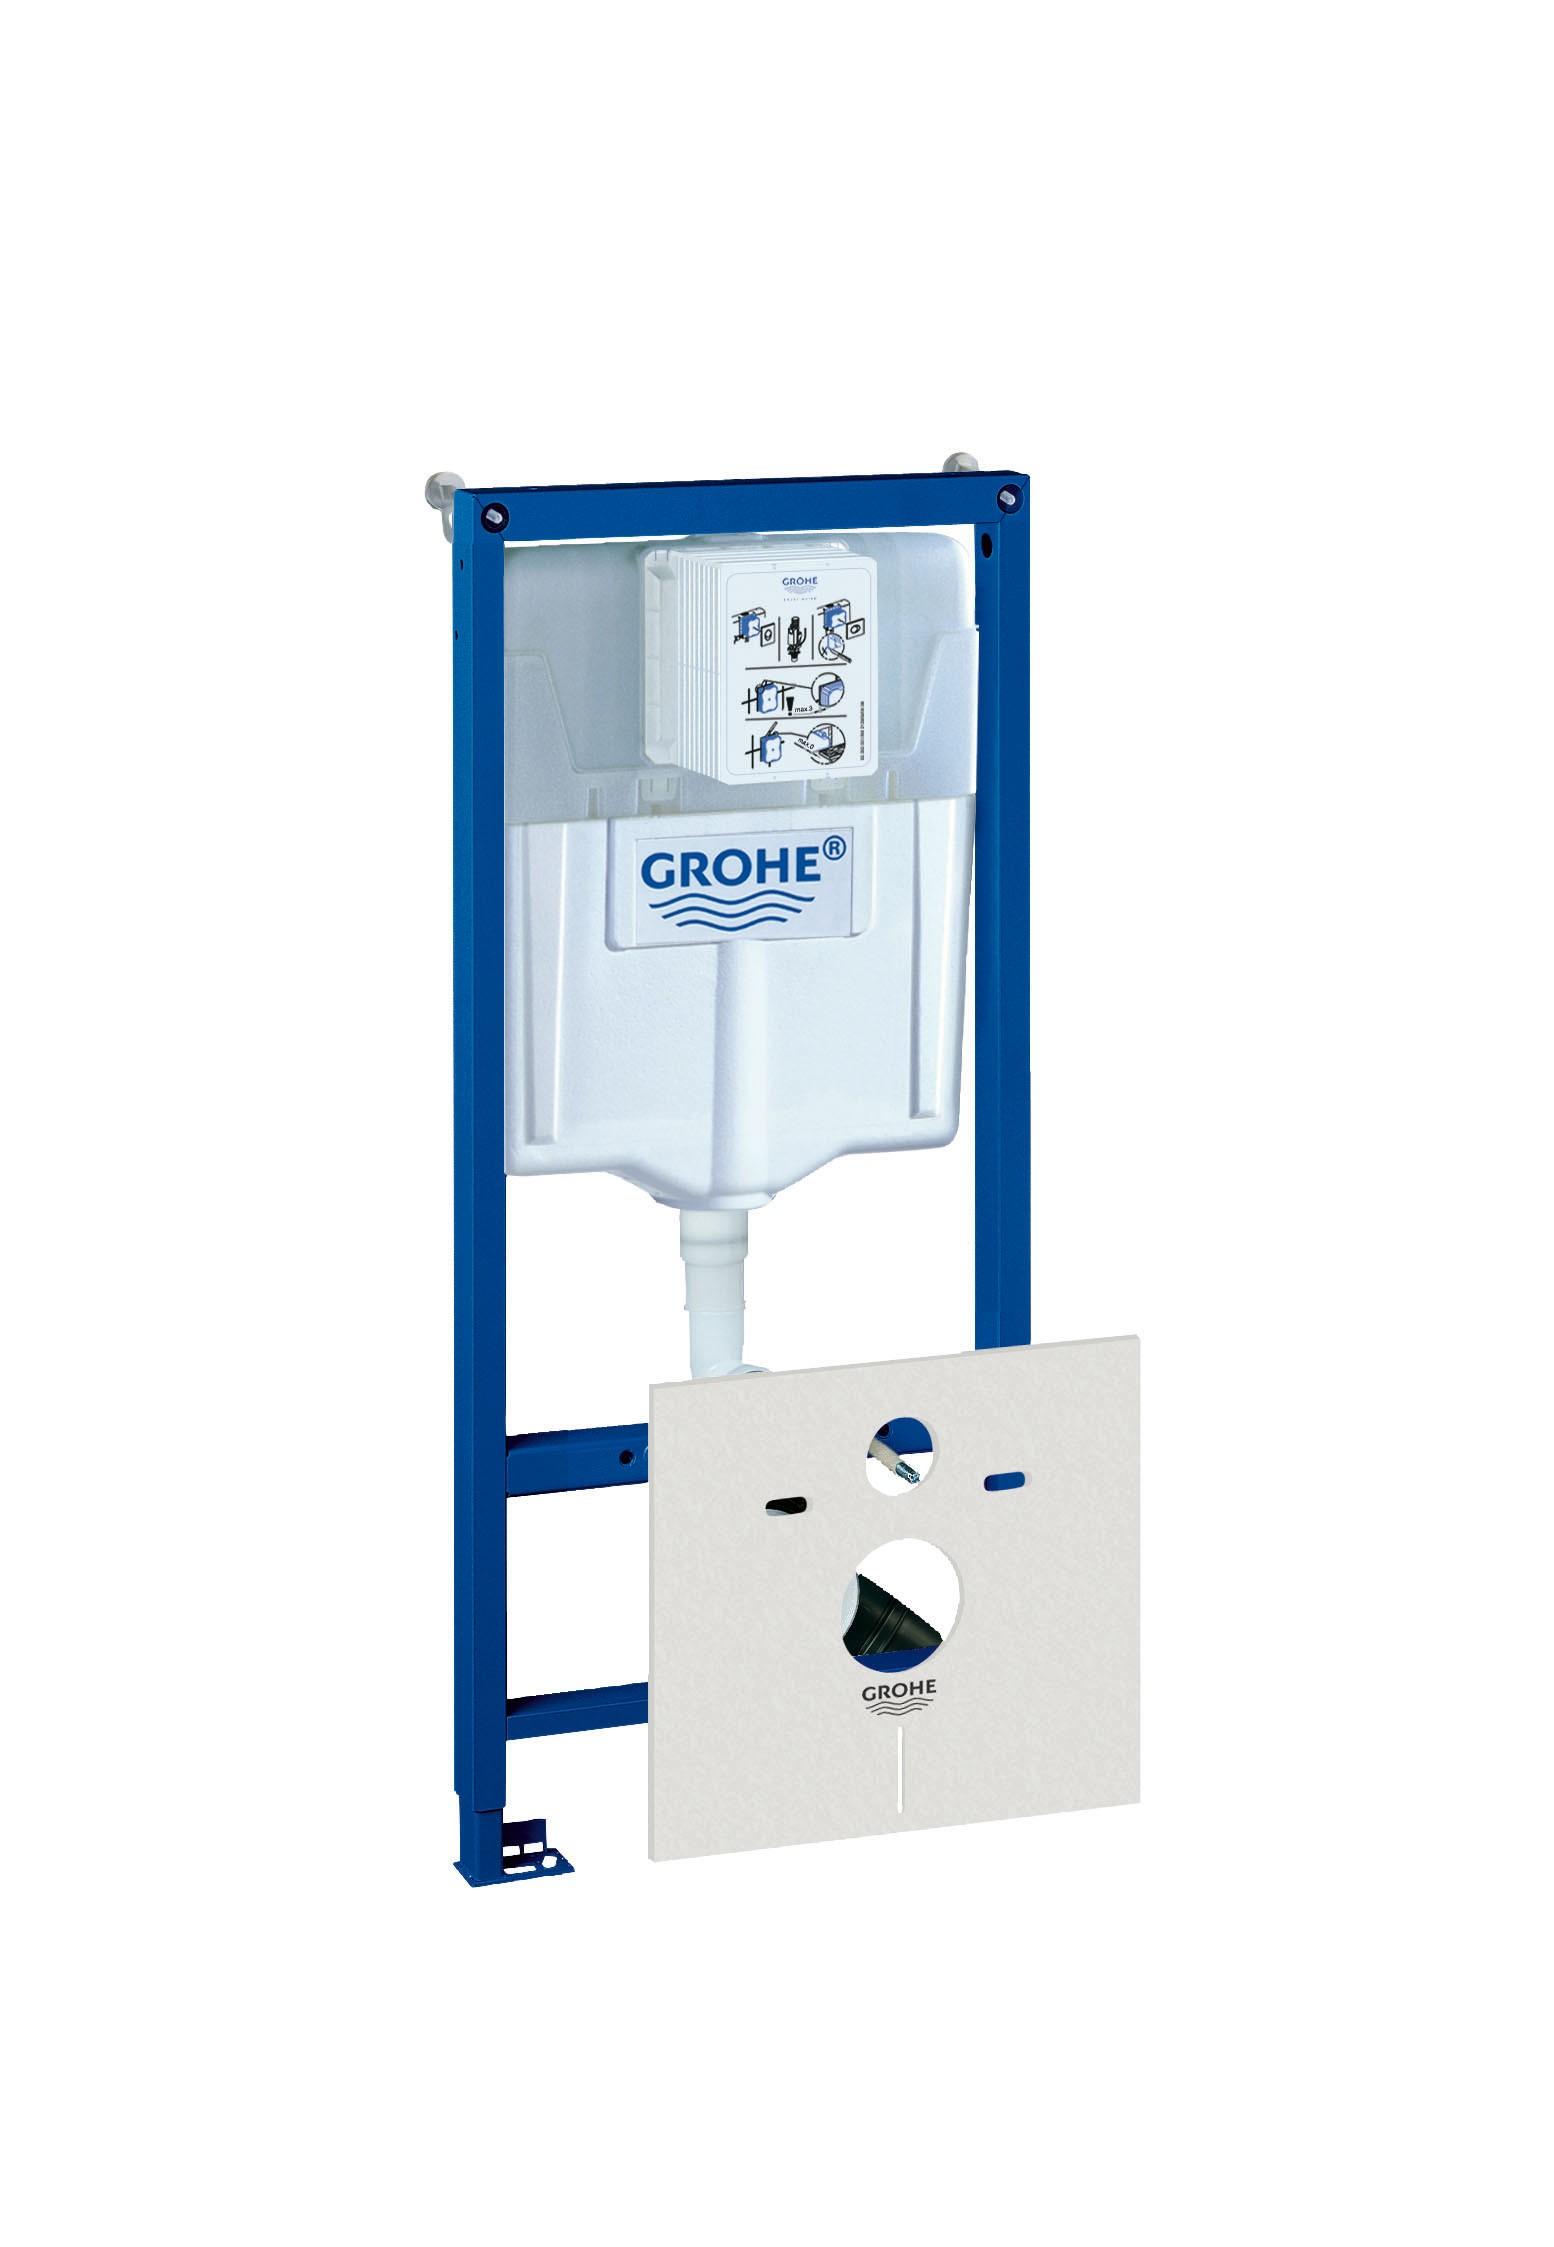 ������� ����������� ��� ������� Grohe 38539001 Rapid SL (1,13 �) � ���������������� ��� ������� ����� ������ (38539001)